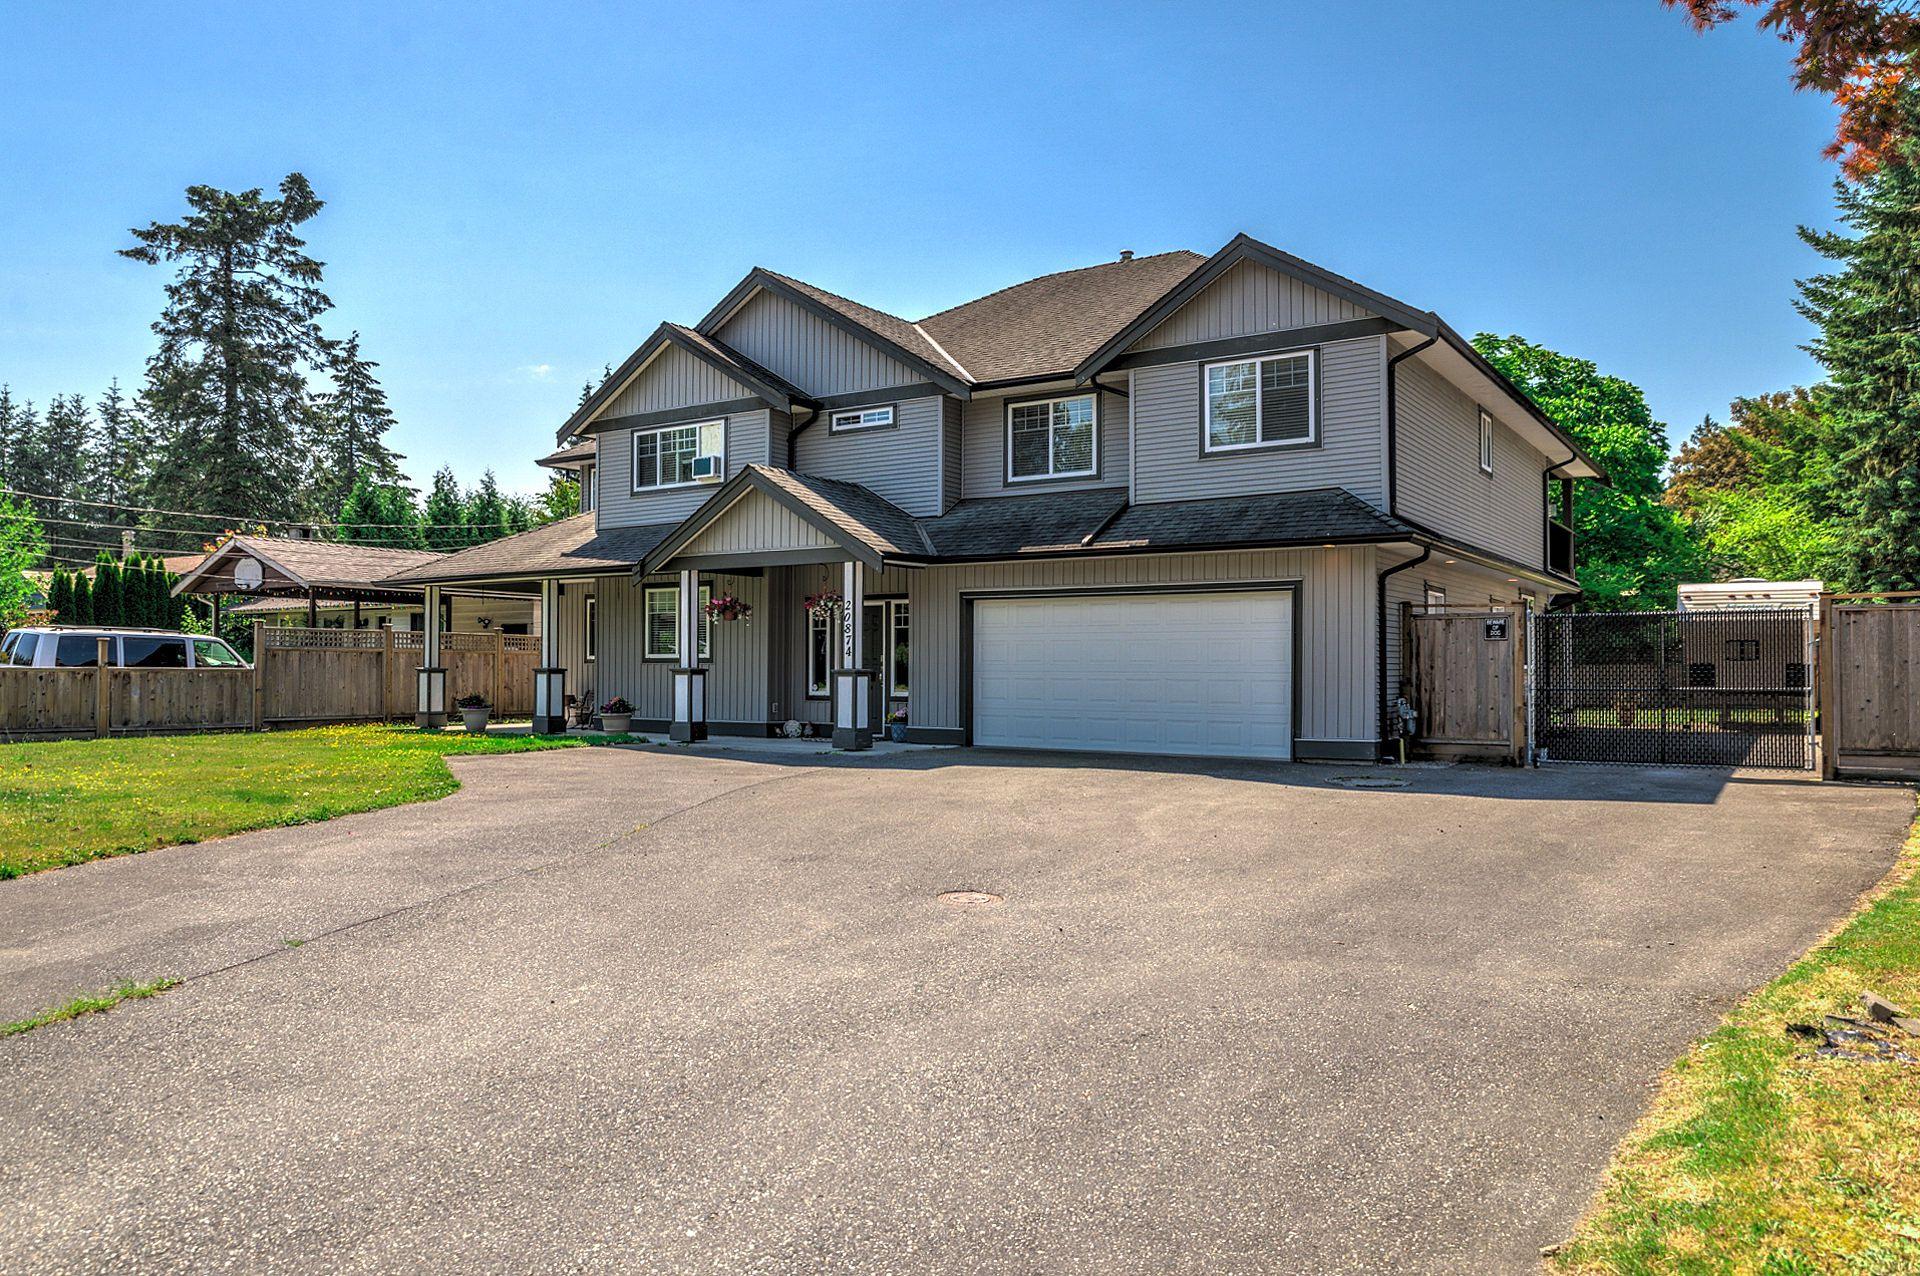 Main Photo: 20874 Camwood Avenue in Maple Ridge: Southwest Maple Ridge House for sale : MLS®# R2282007